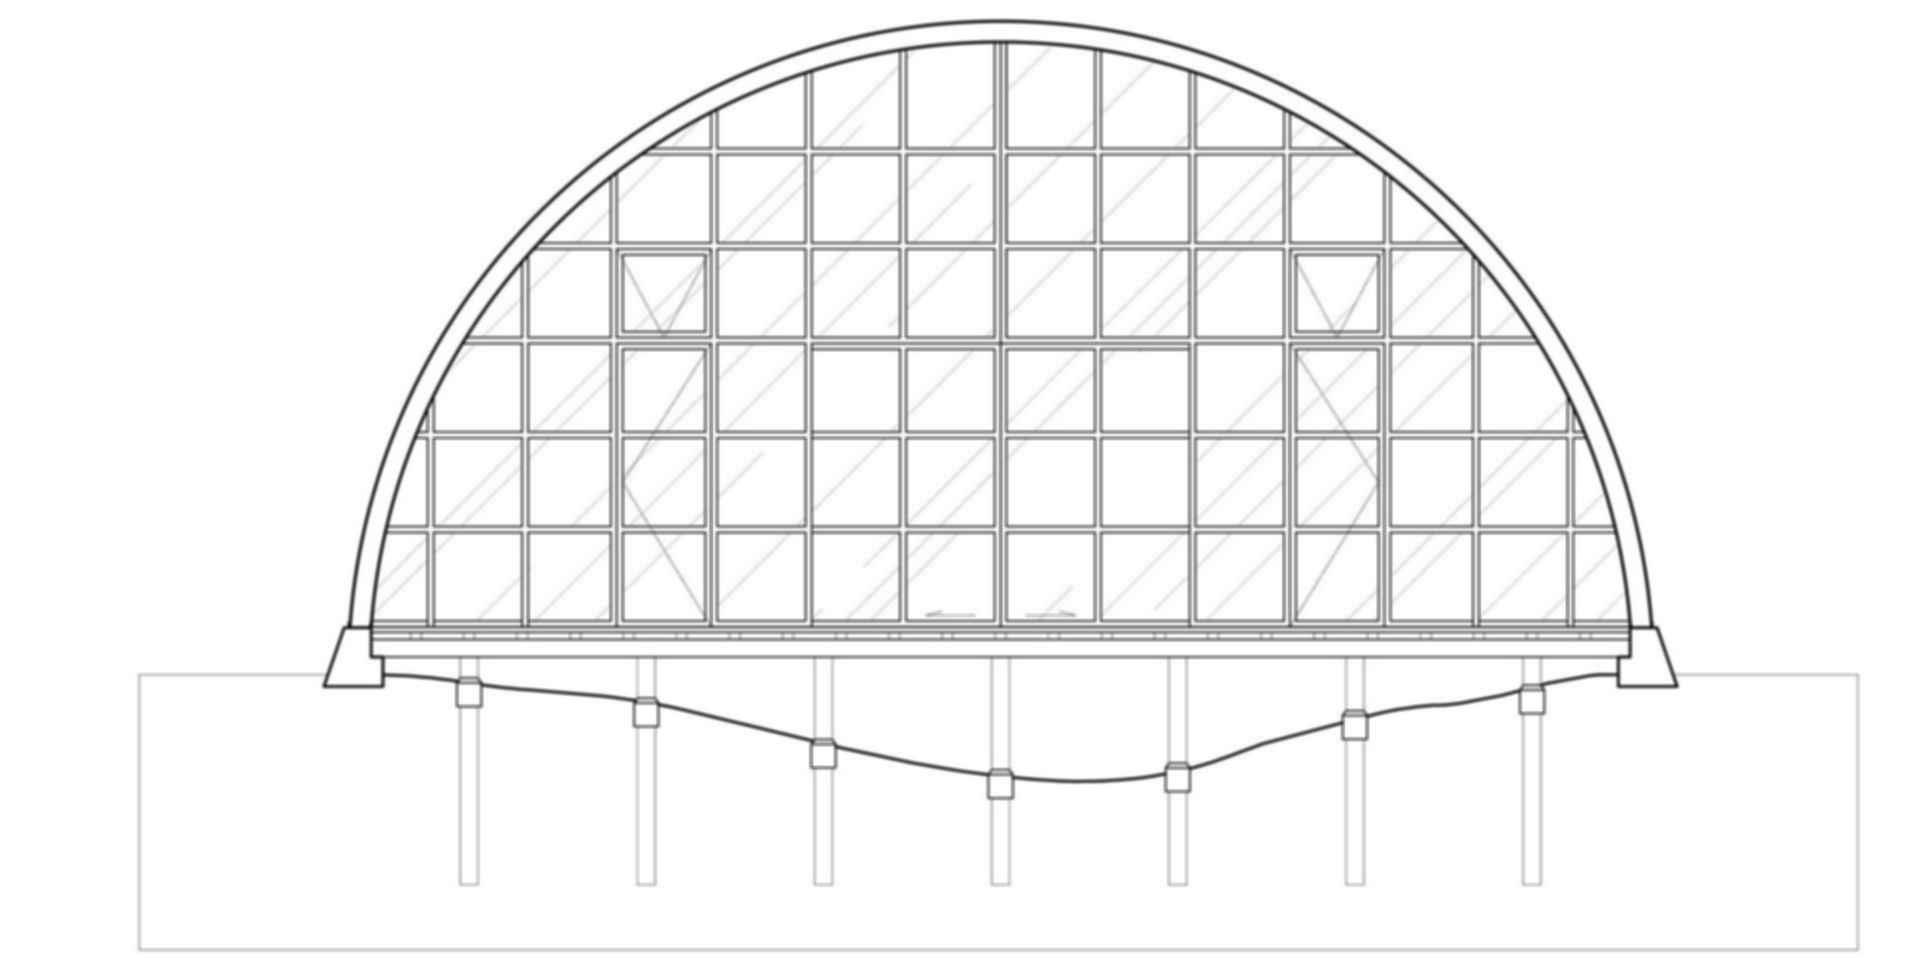 ARCA - Concept Design